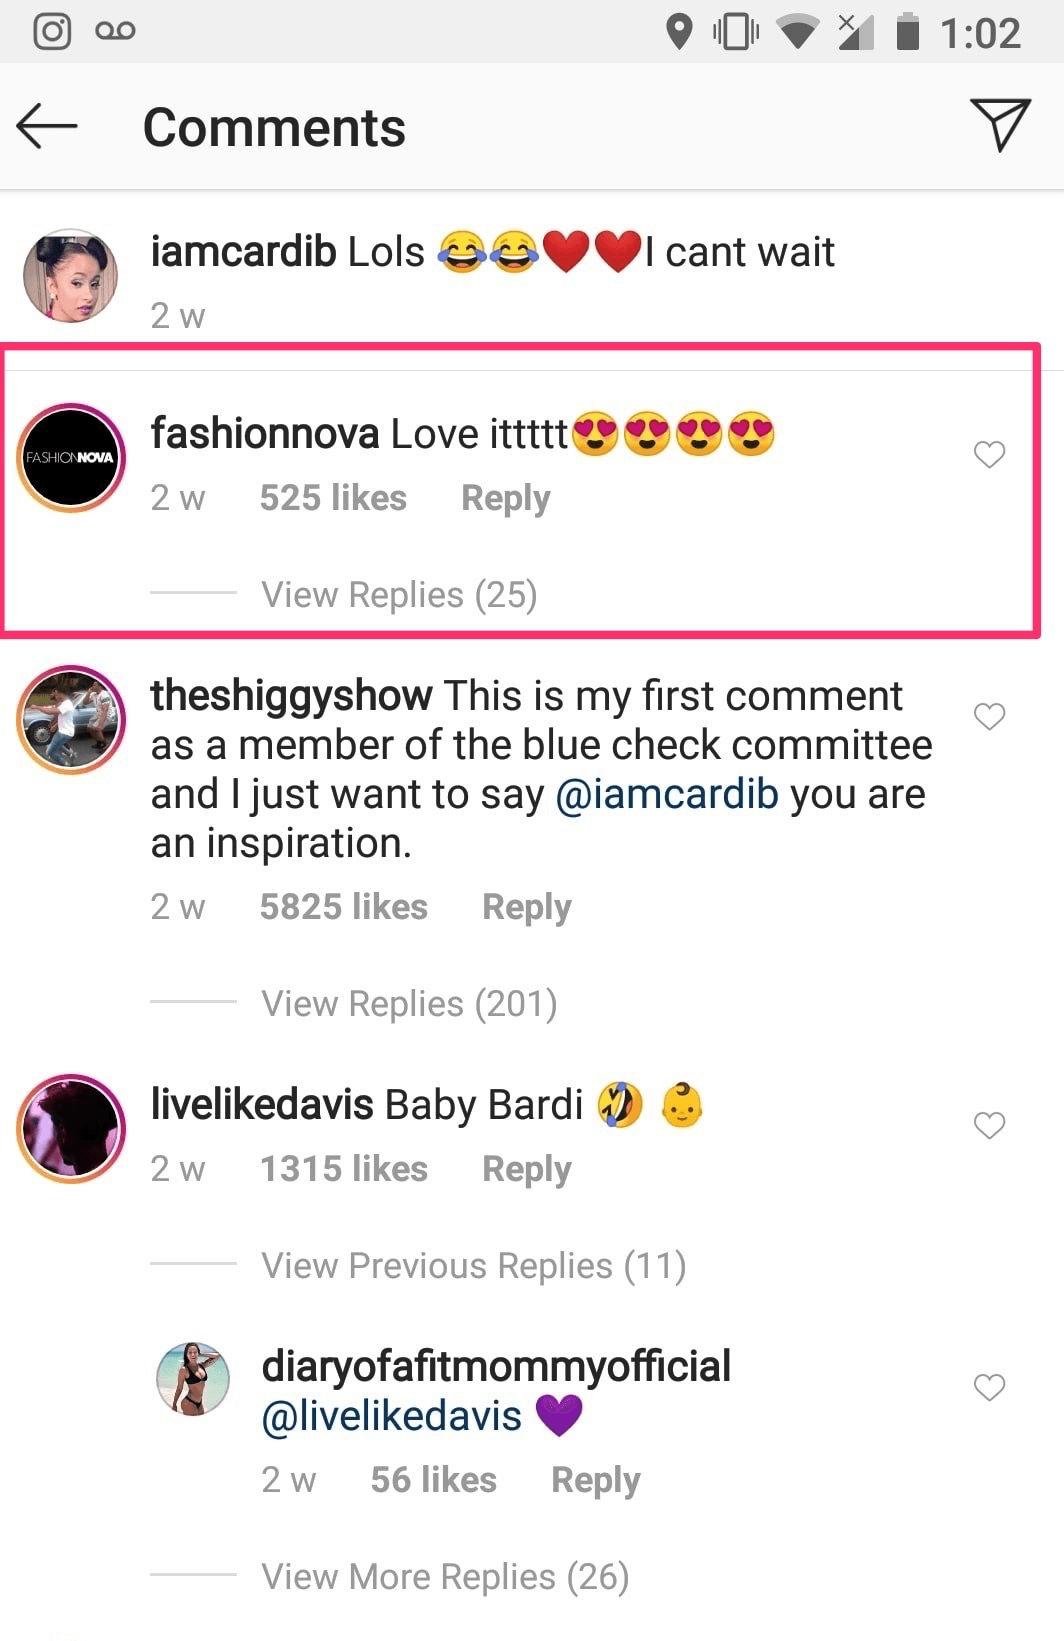 algoritmo do instagram comentario engajamento